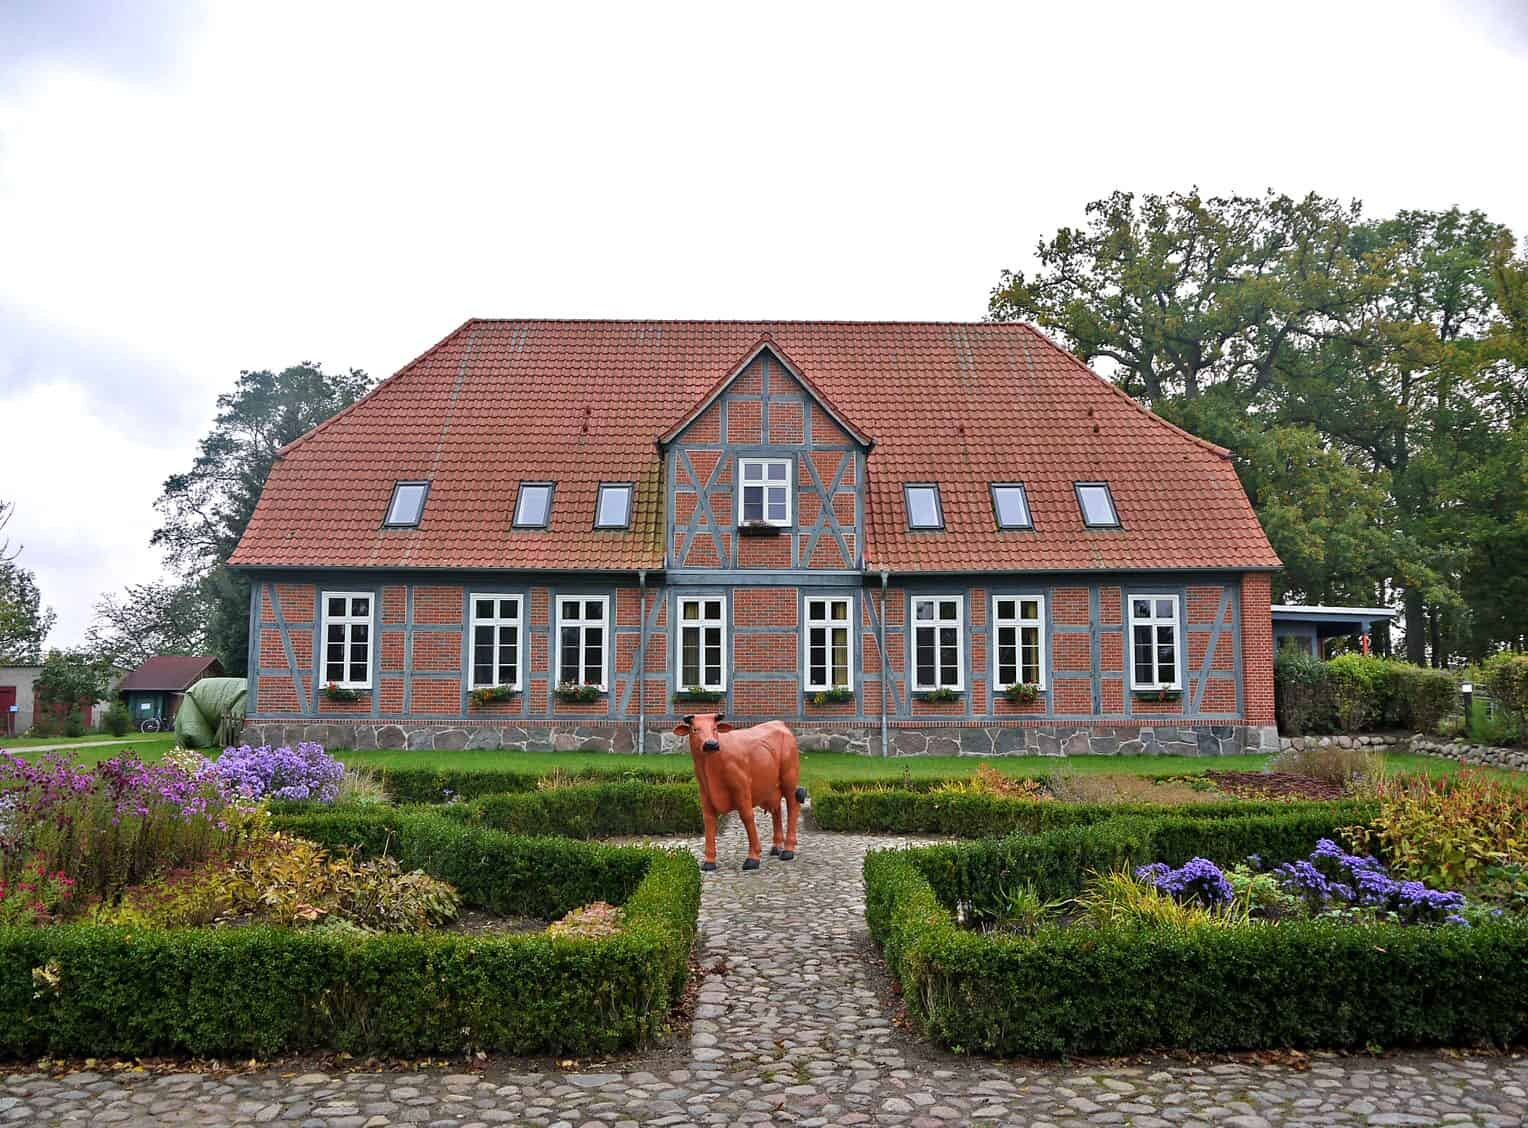 Foto: Der Arche-Hof Domäne Kneese des Lebenshilfewerkes Mölln-Hagenow. Fotoautor: LHW Mölln-Hagenow